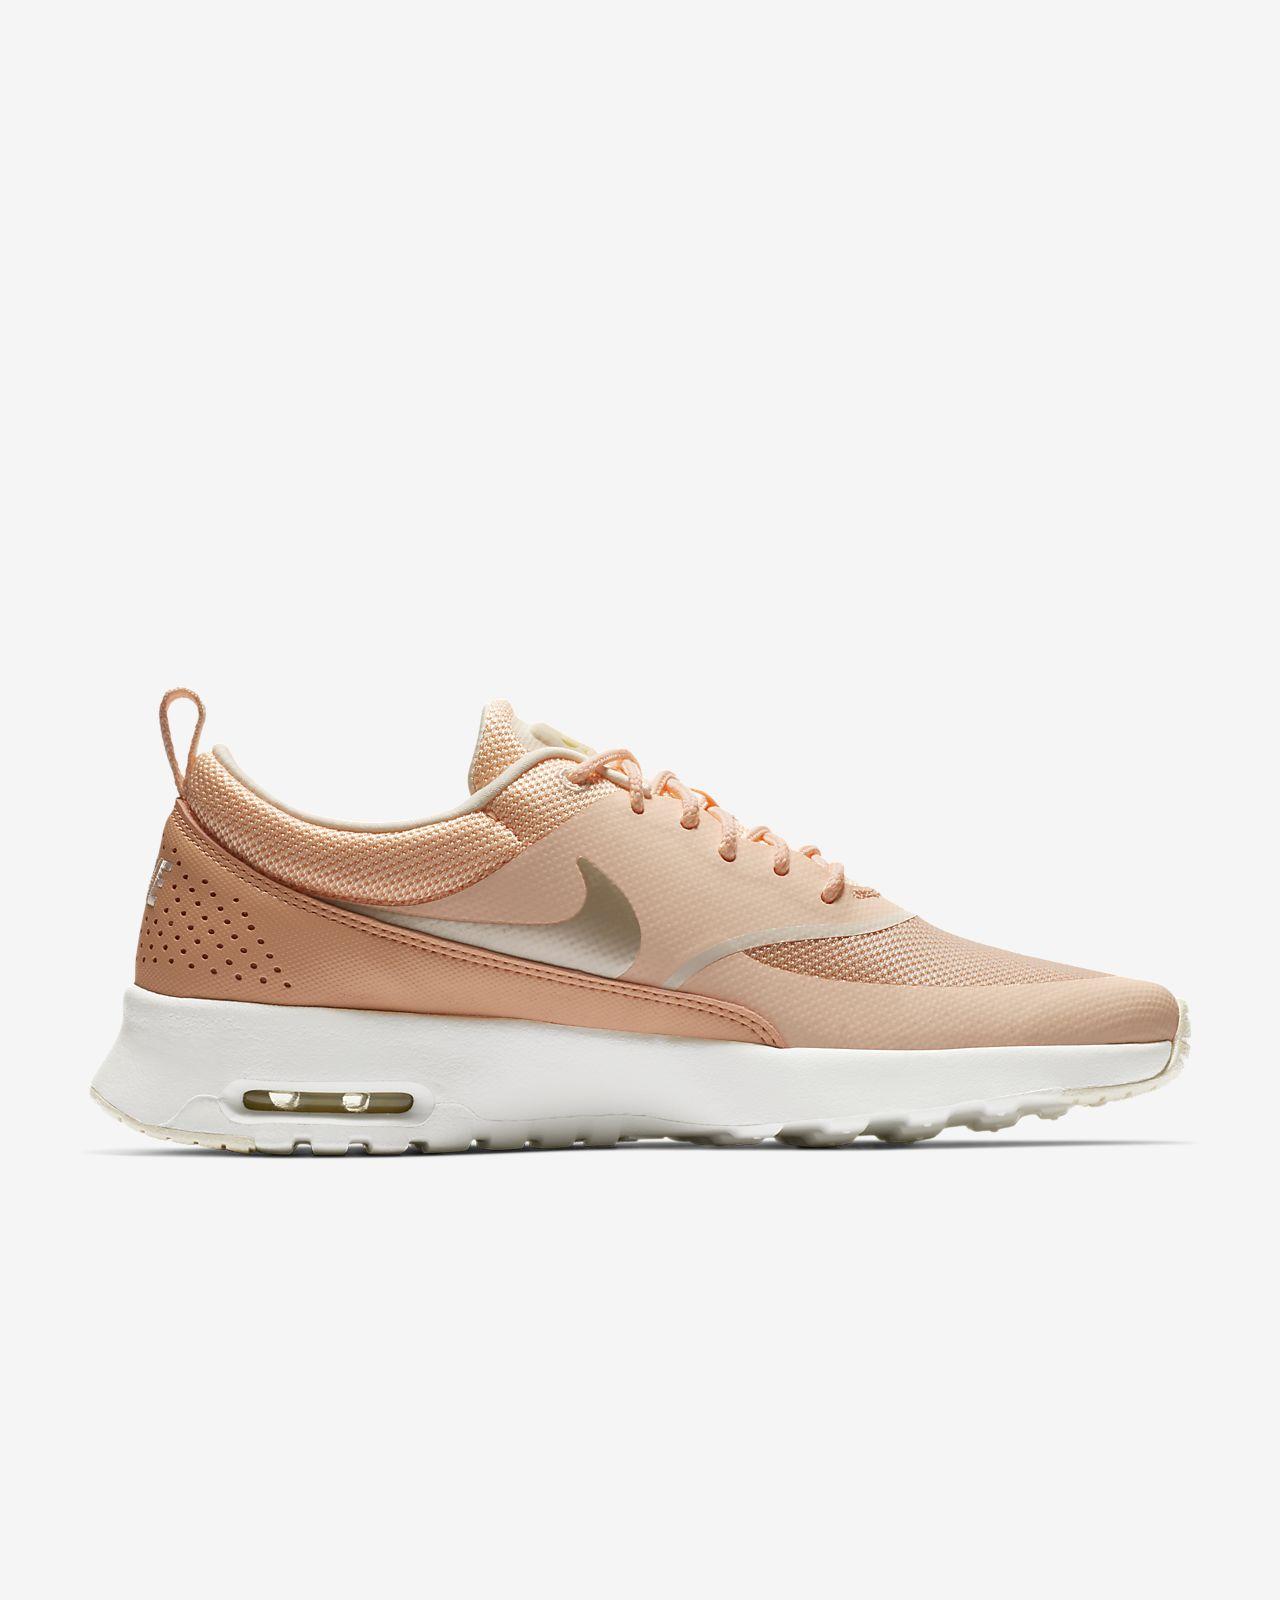 on sale 85c54 94d6e ... Nike Air Max Thea Damesschoen